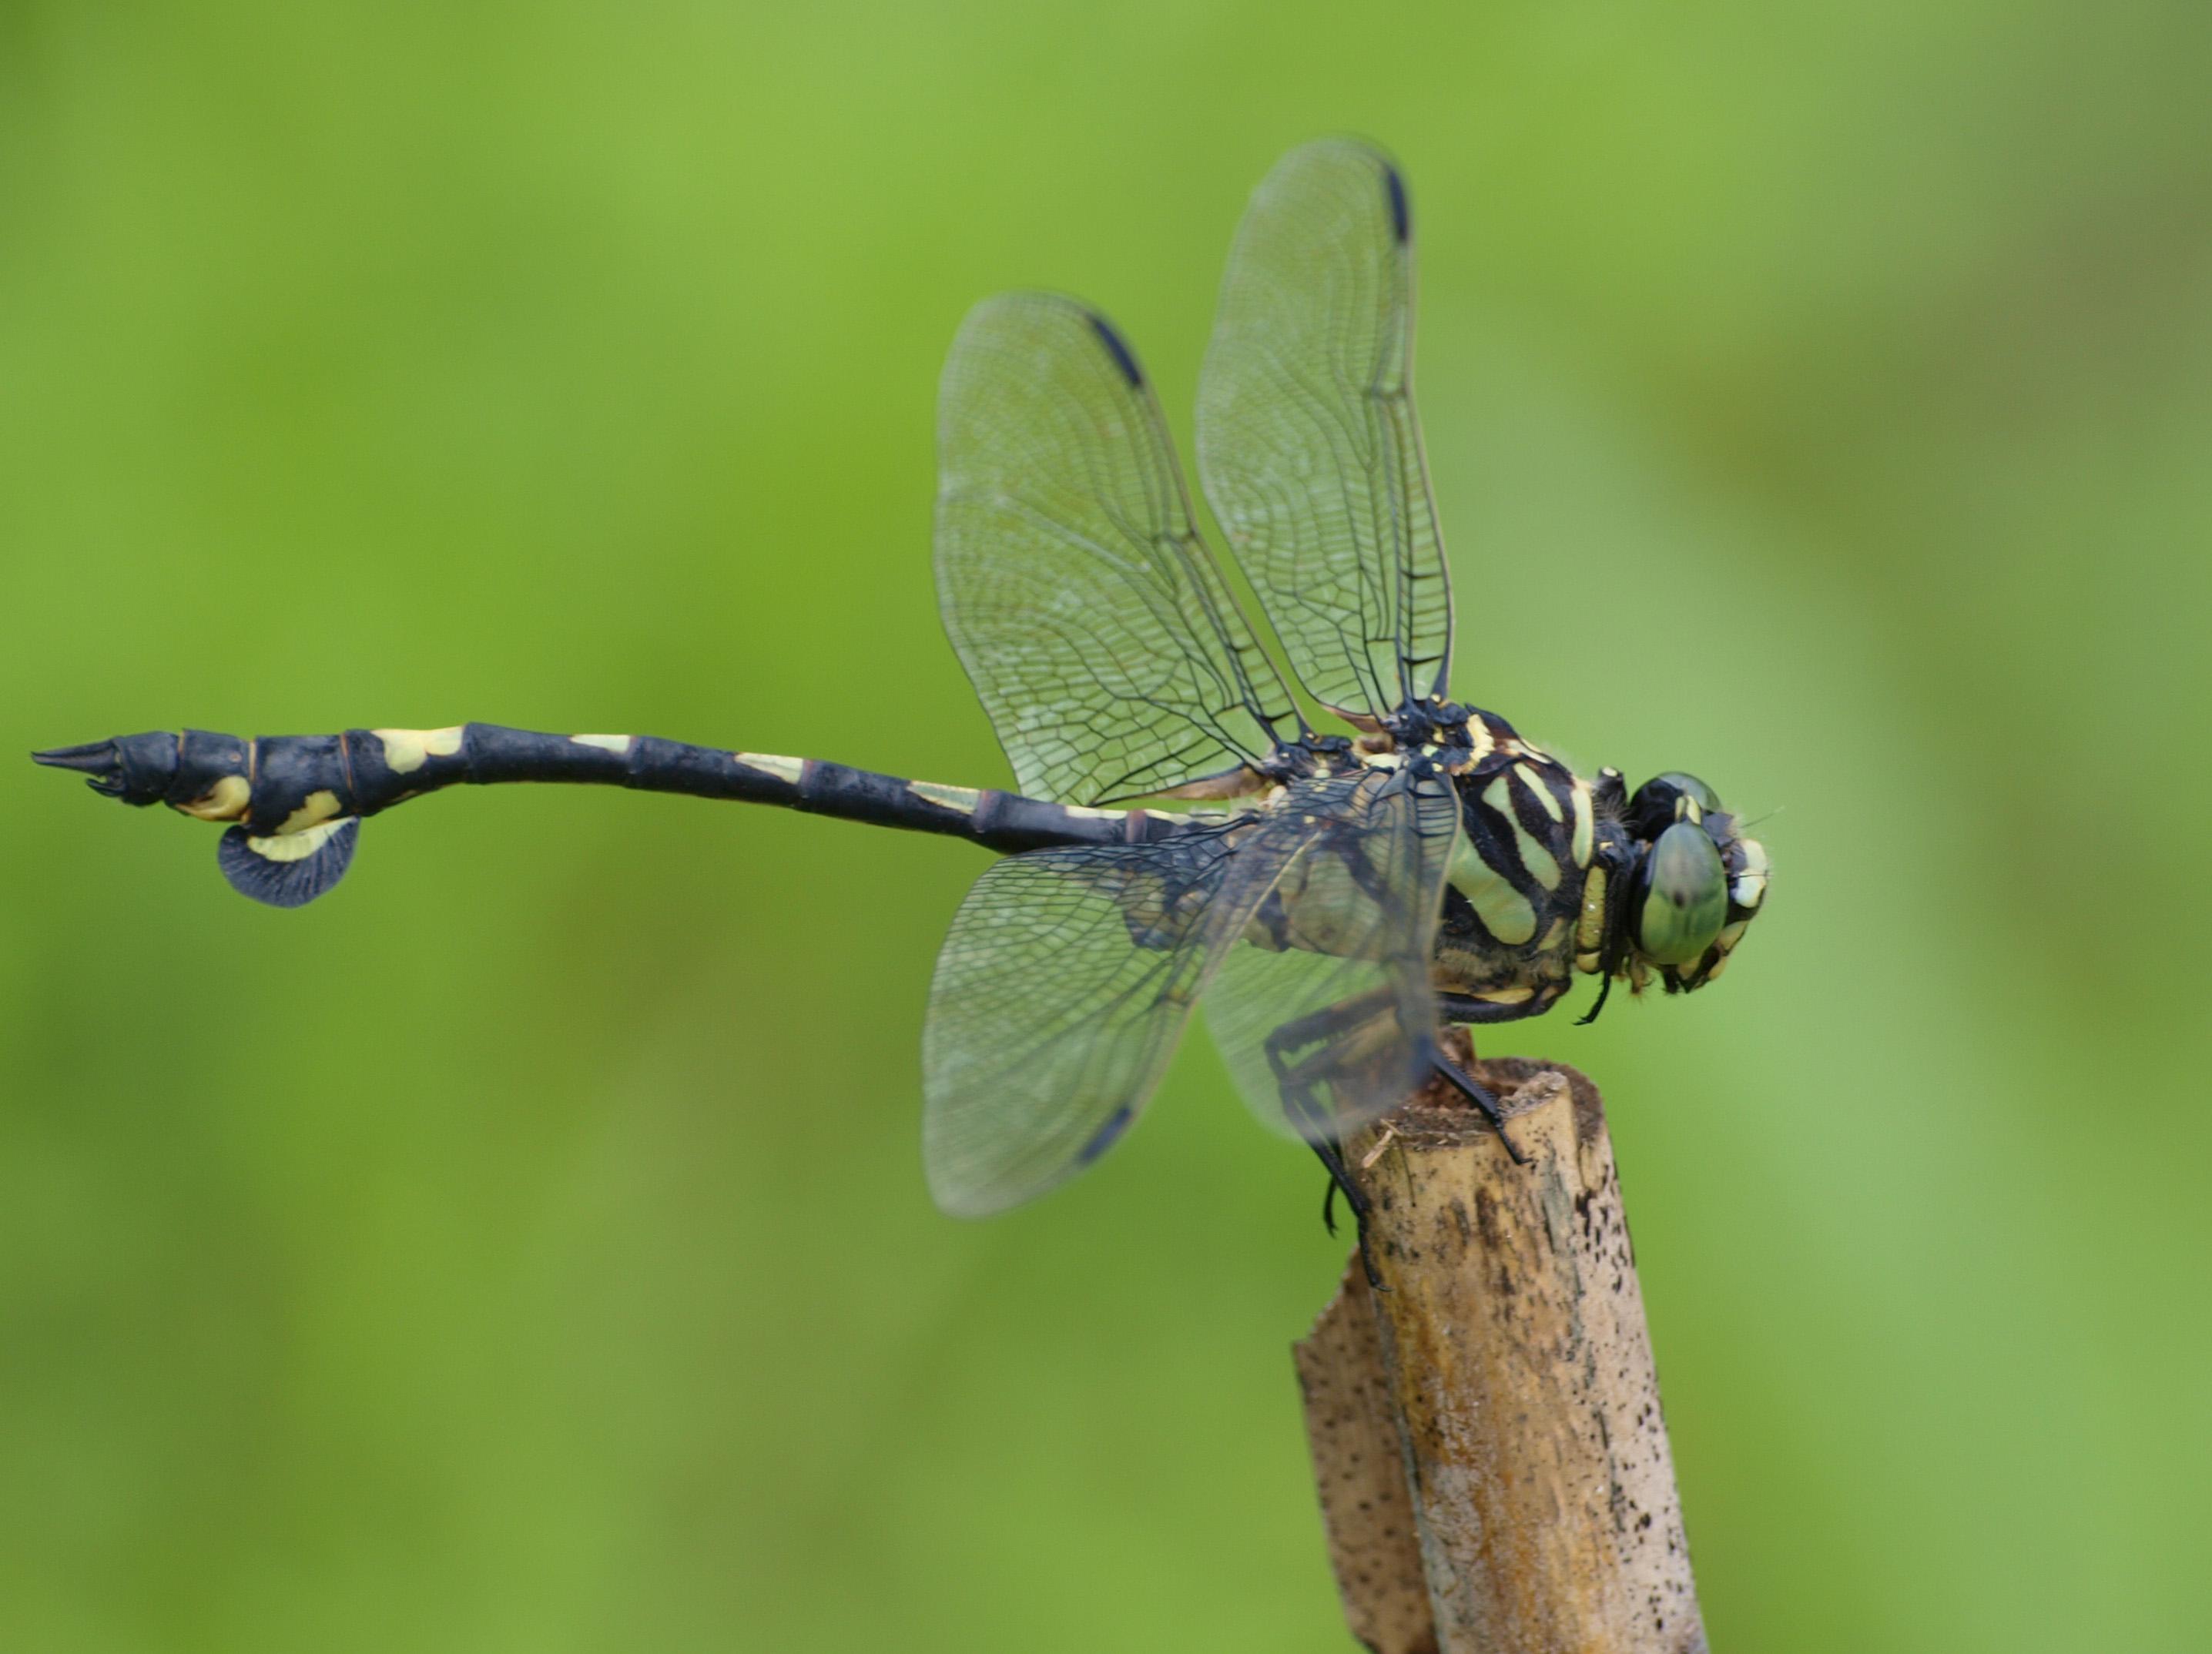 Sinictinogomphus_clavatus(1).jpg